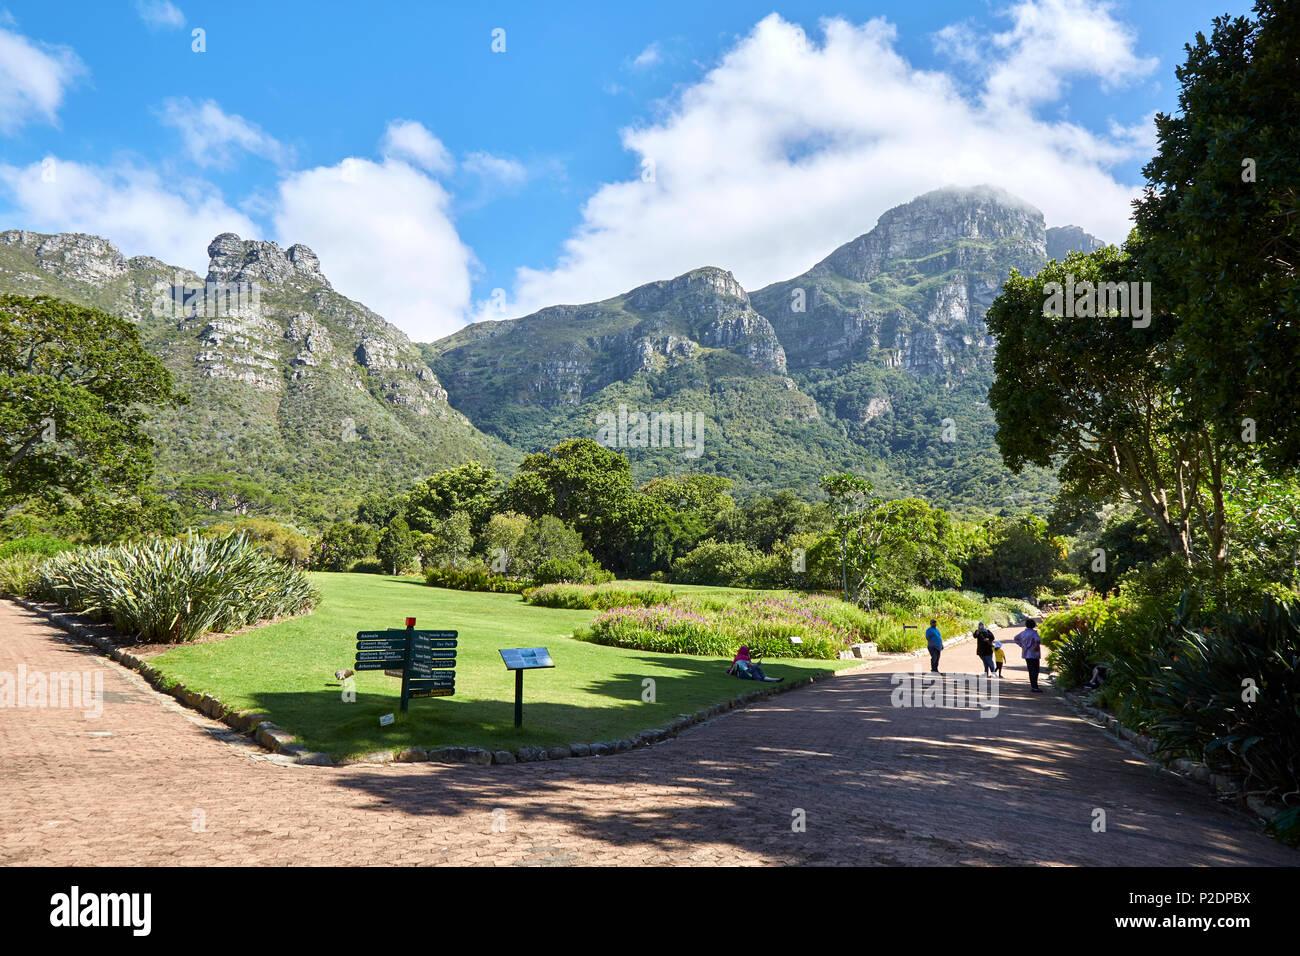 Kirstenbosch Botanical Gardens, Cape Town. - Stock Image